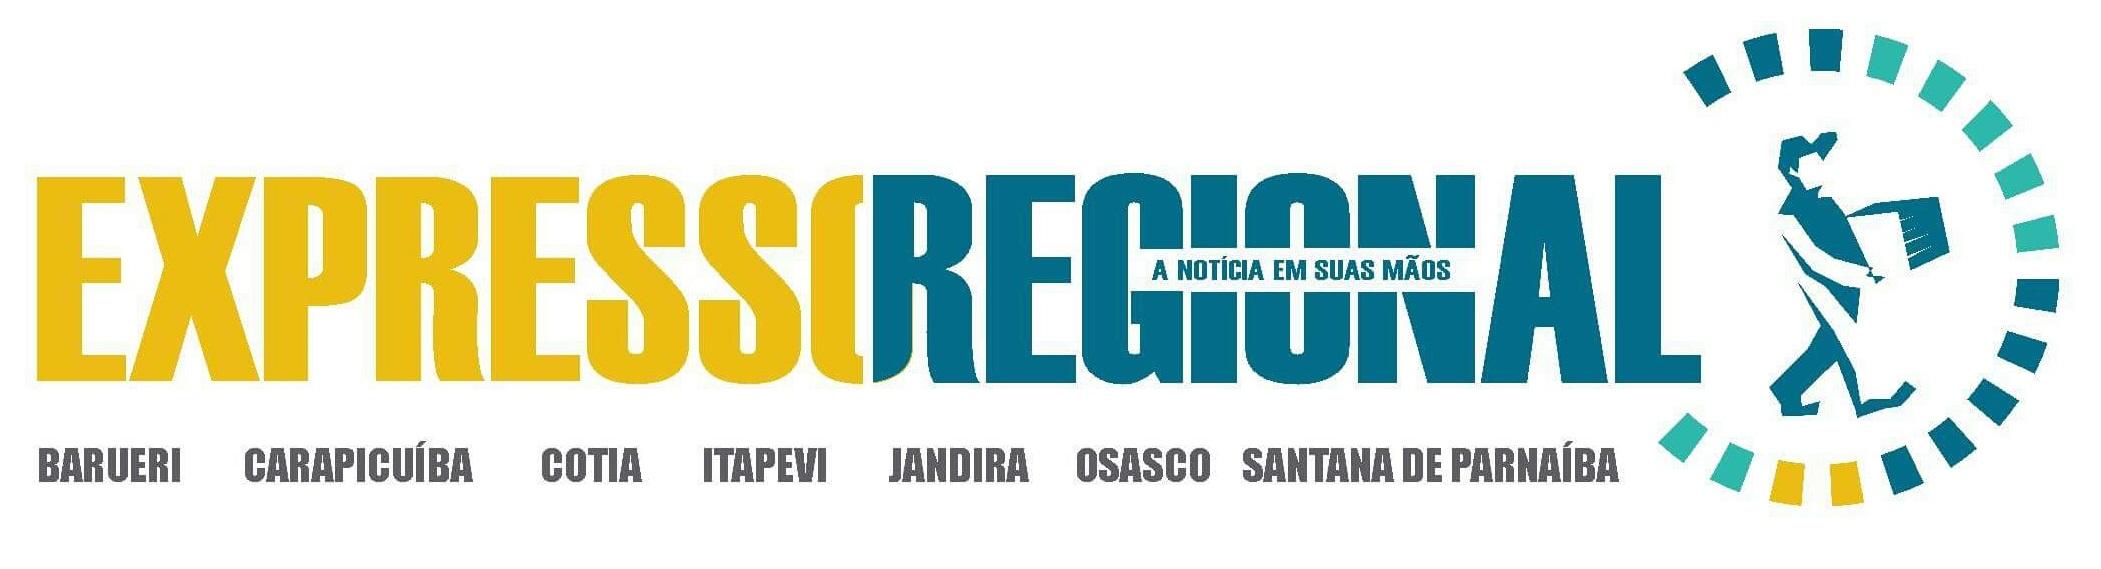 Jornal Expresso Regional